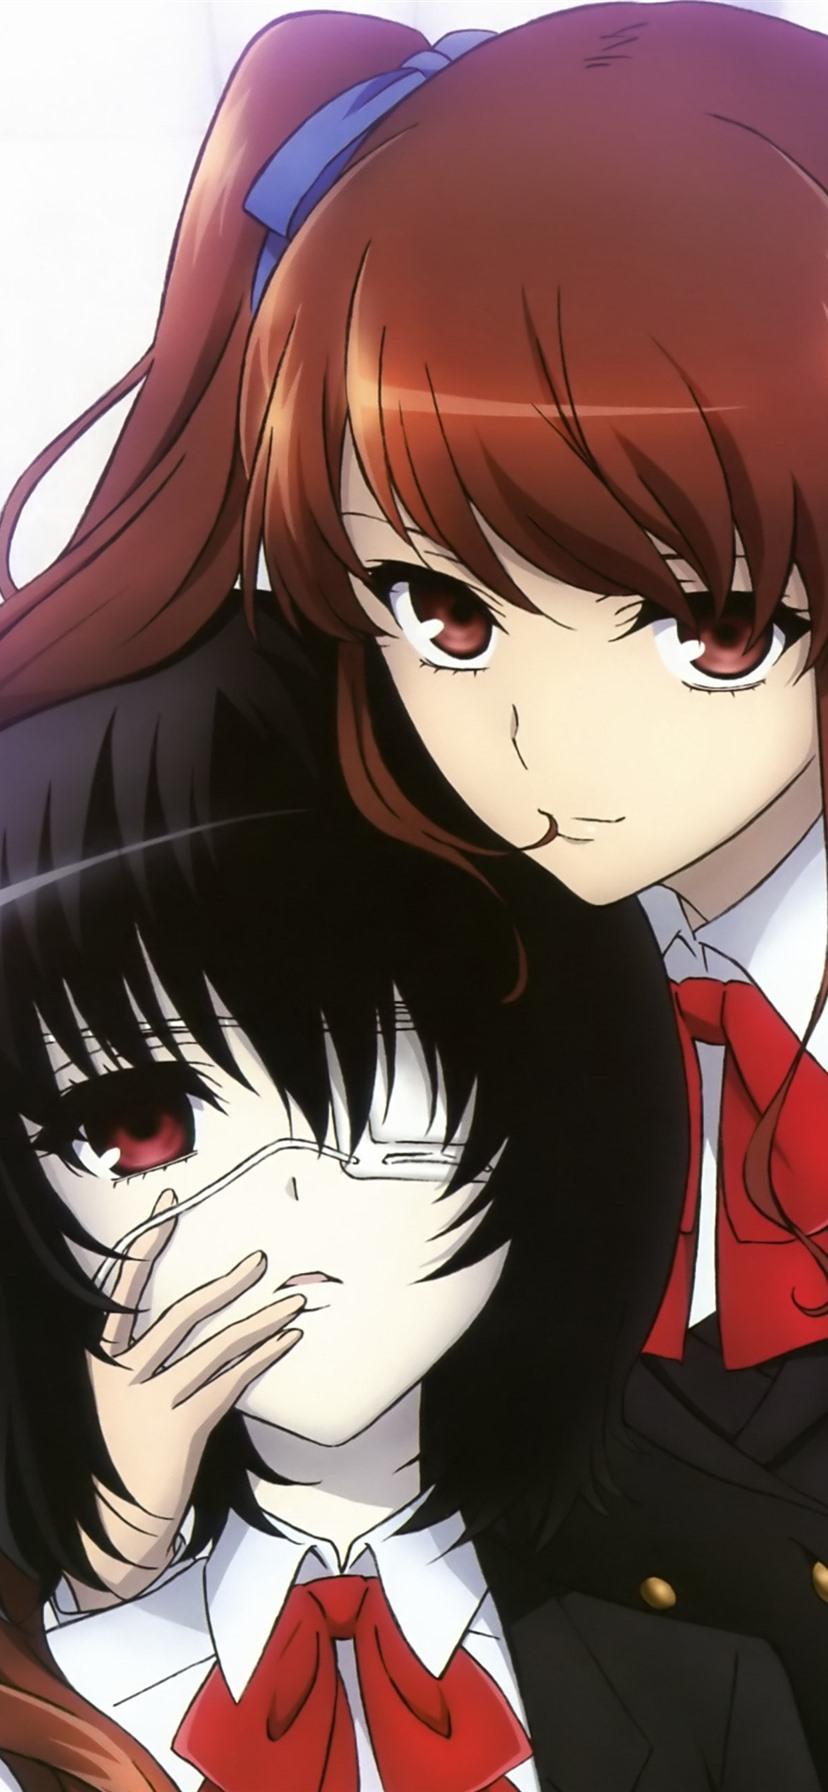 Wallpaper Two Anime Girls Schoolgirl 3840x2160 Uhd 4k